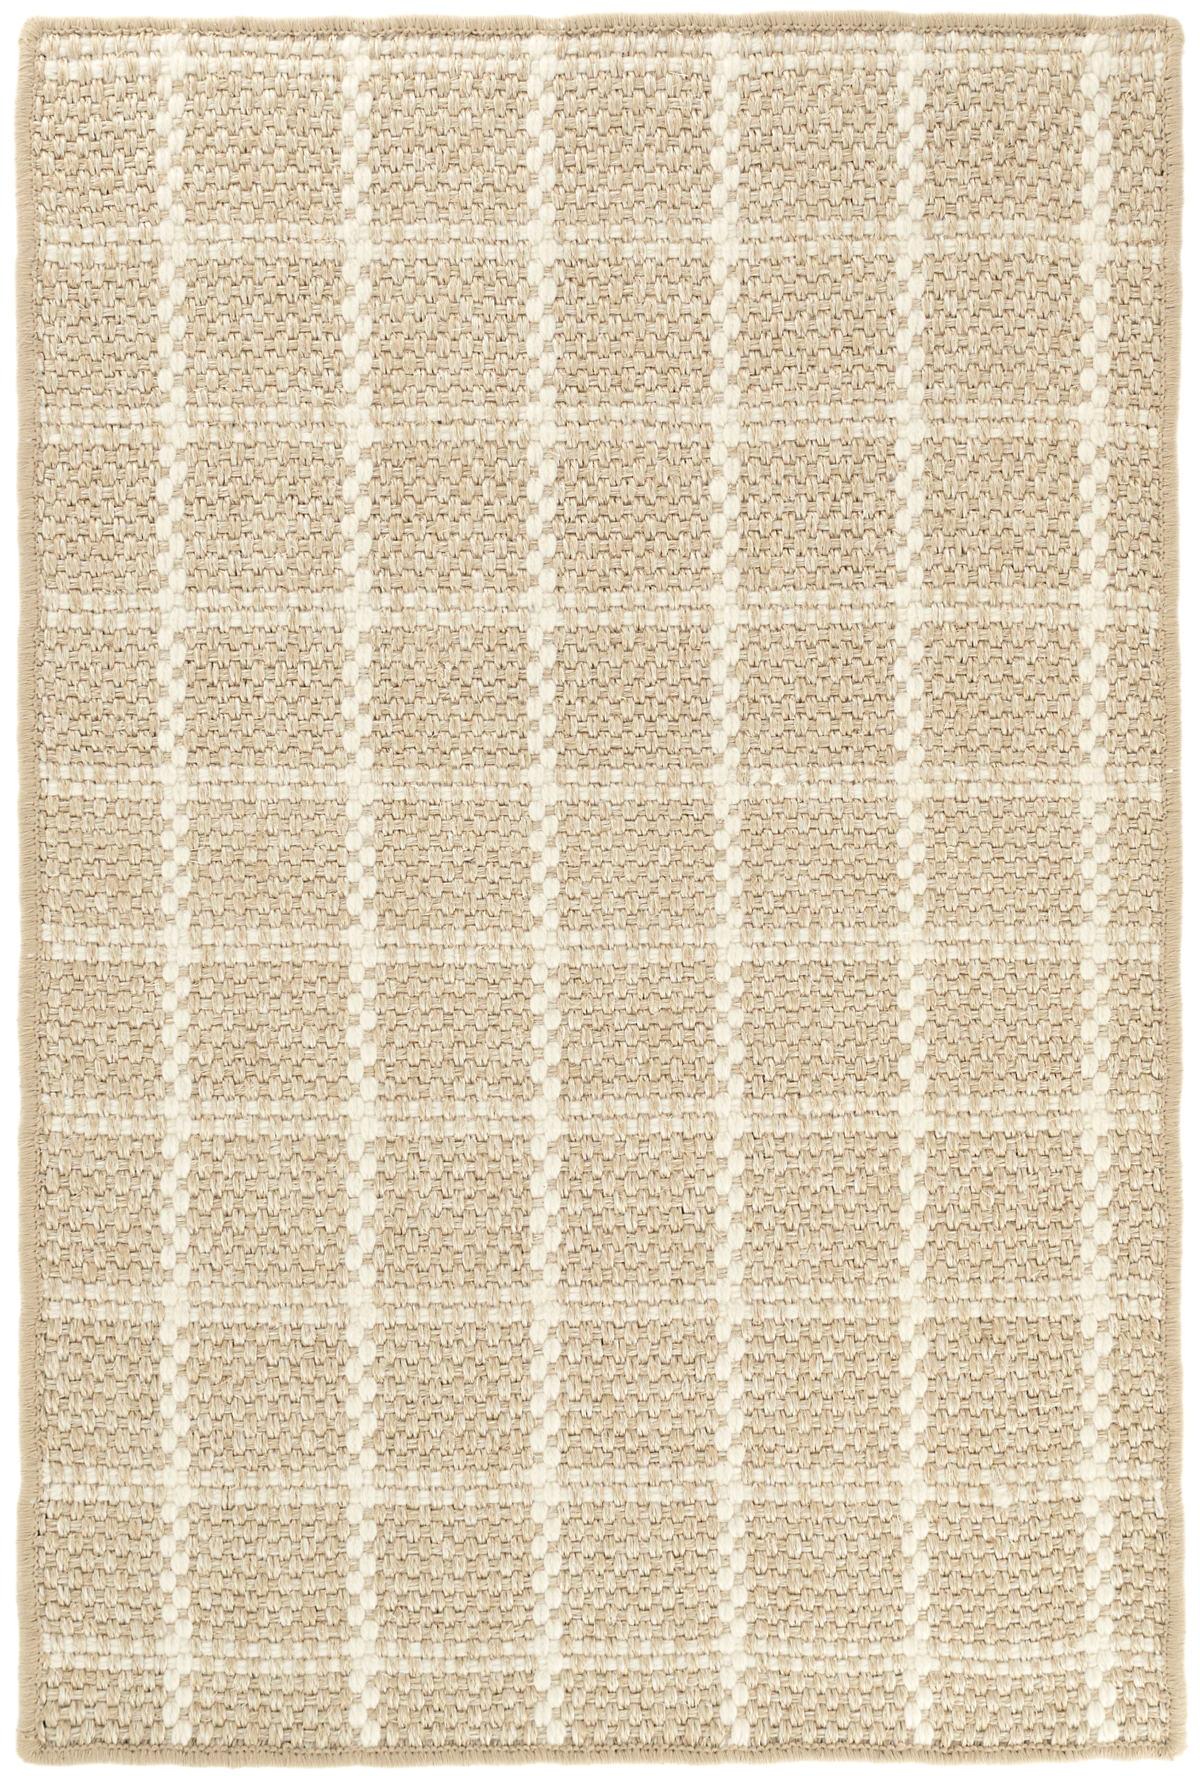 Framework Wheat Woven Sisal Rug